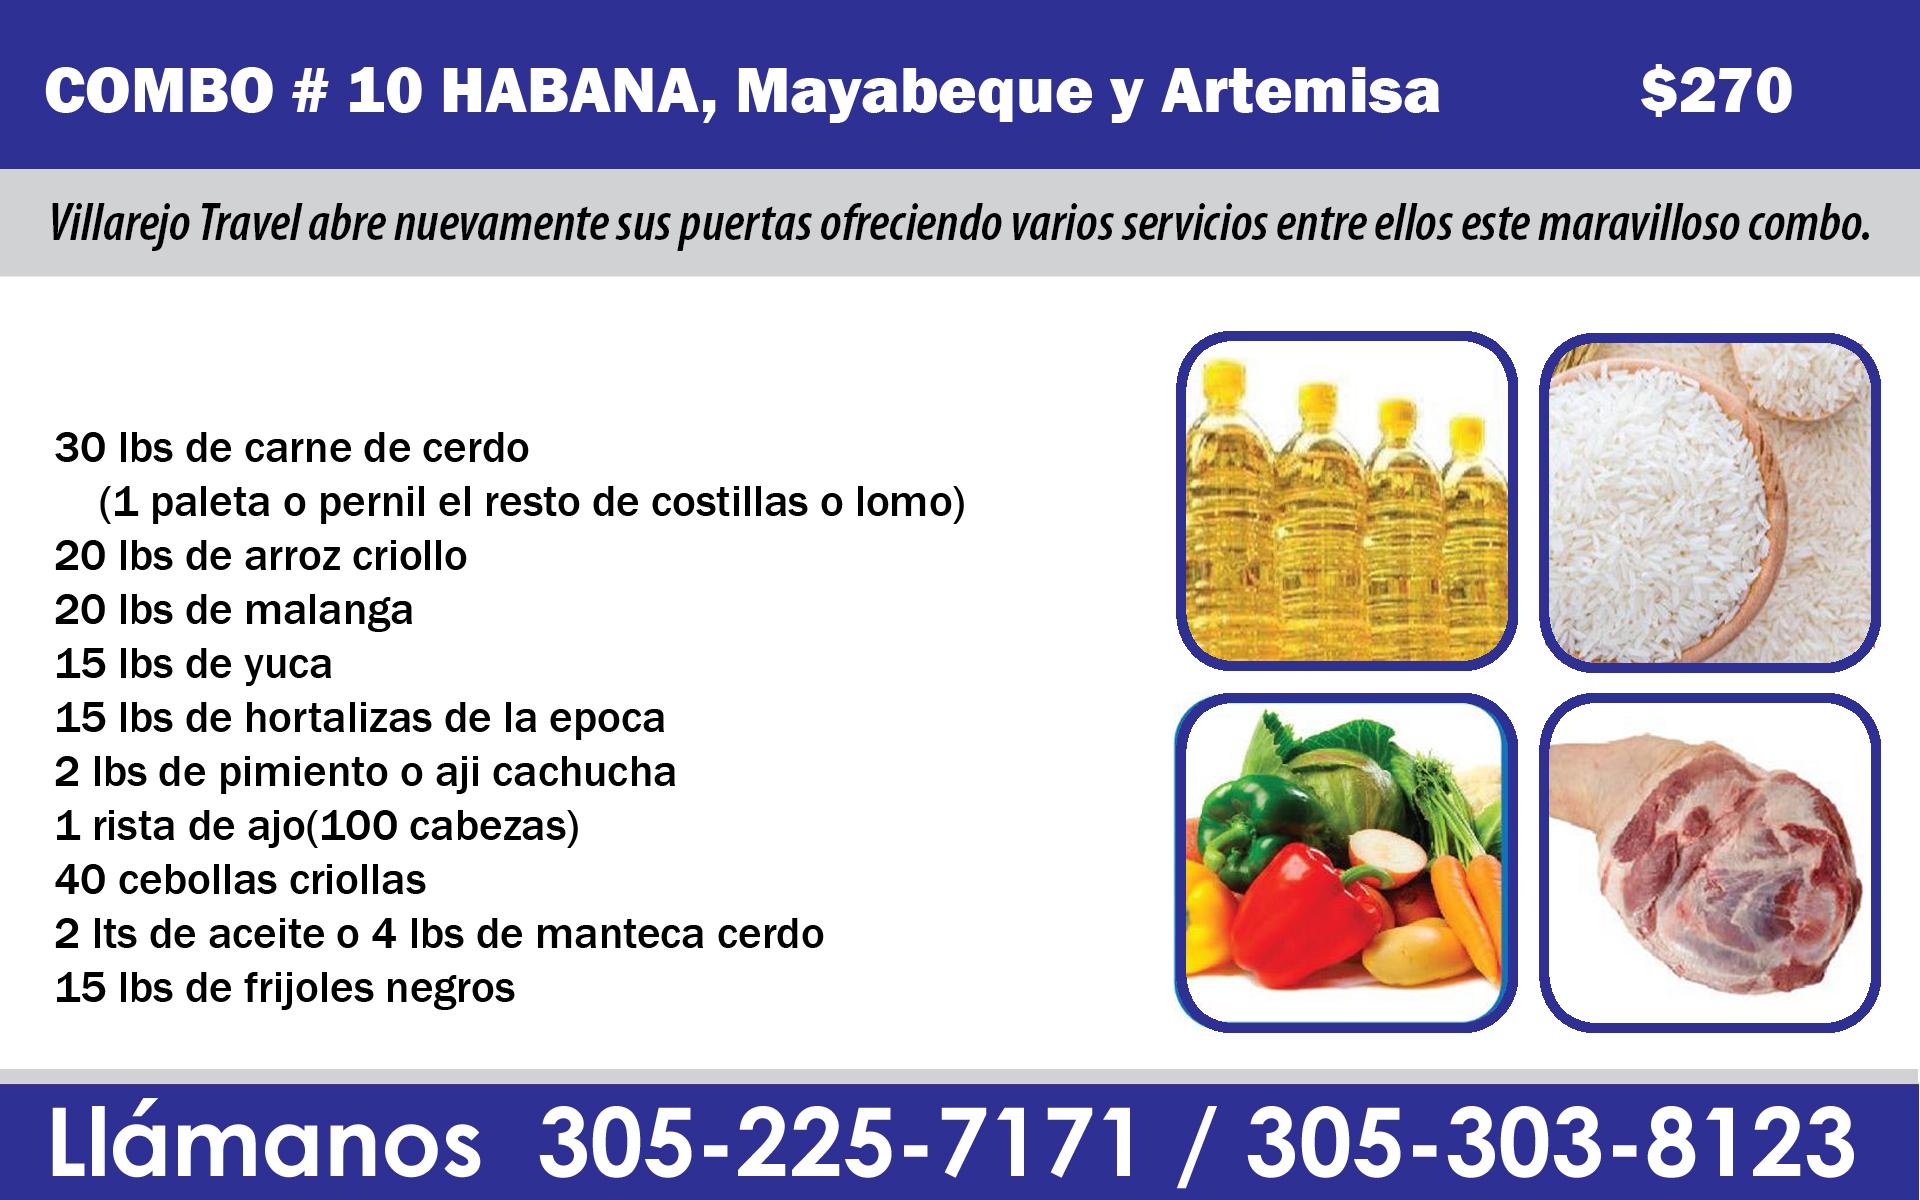 Combo #10 Habana ciudad , Mayabeque, artemisa